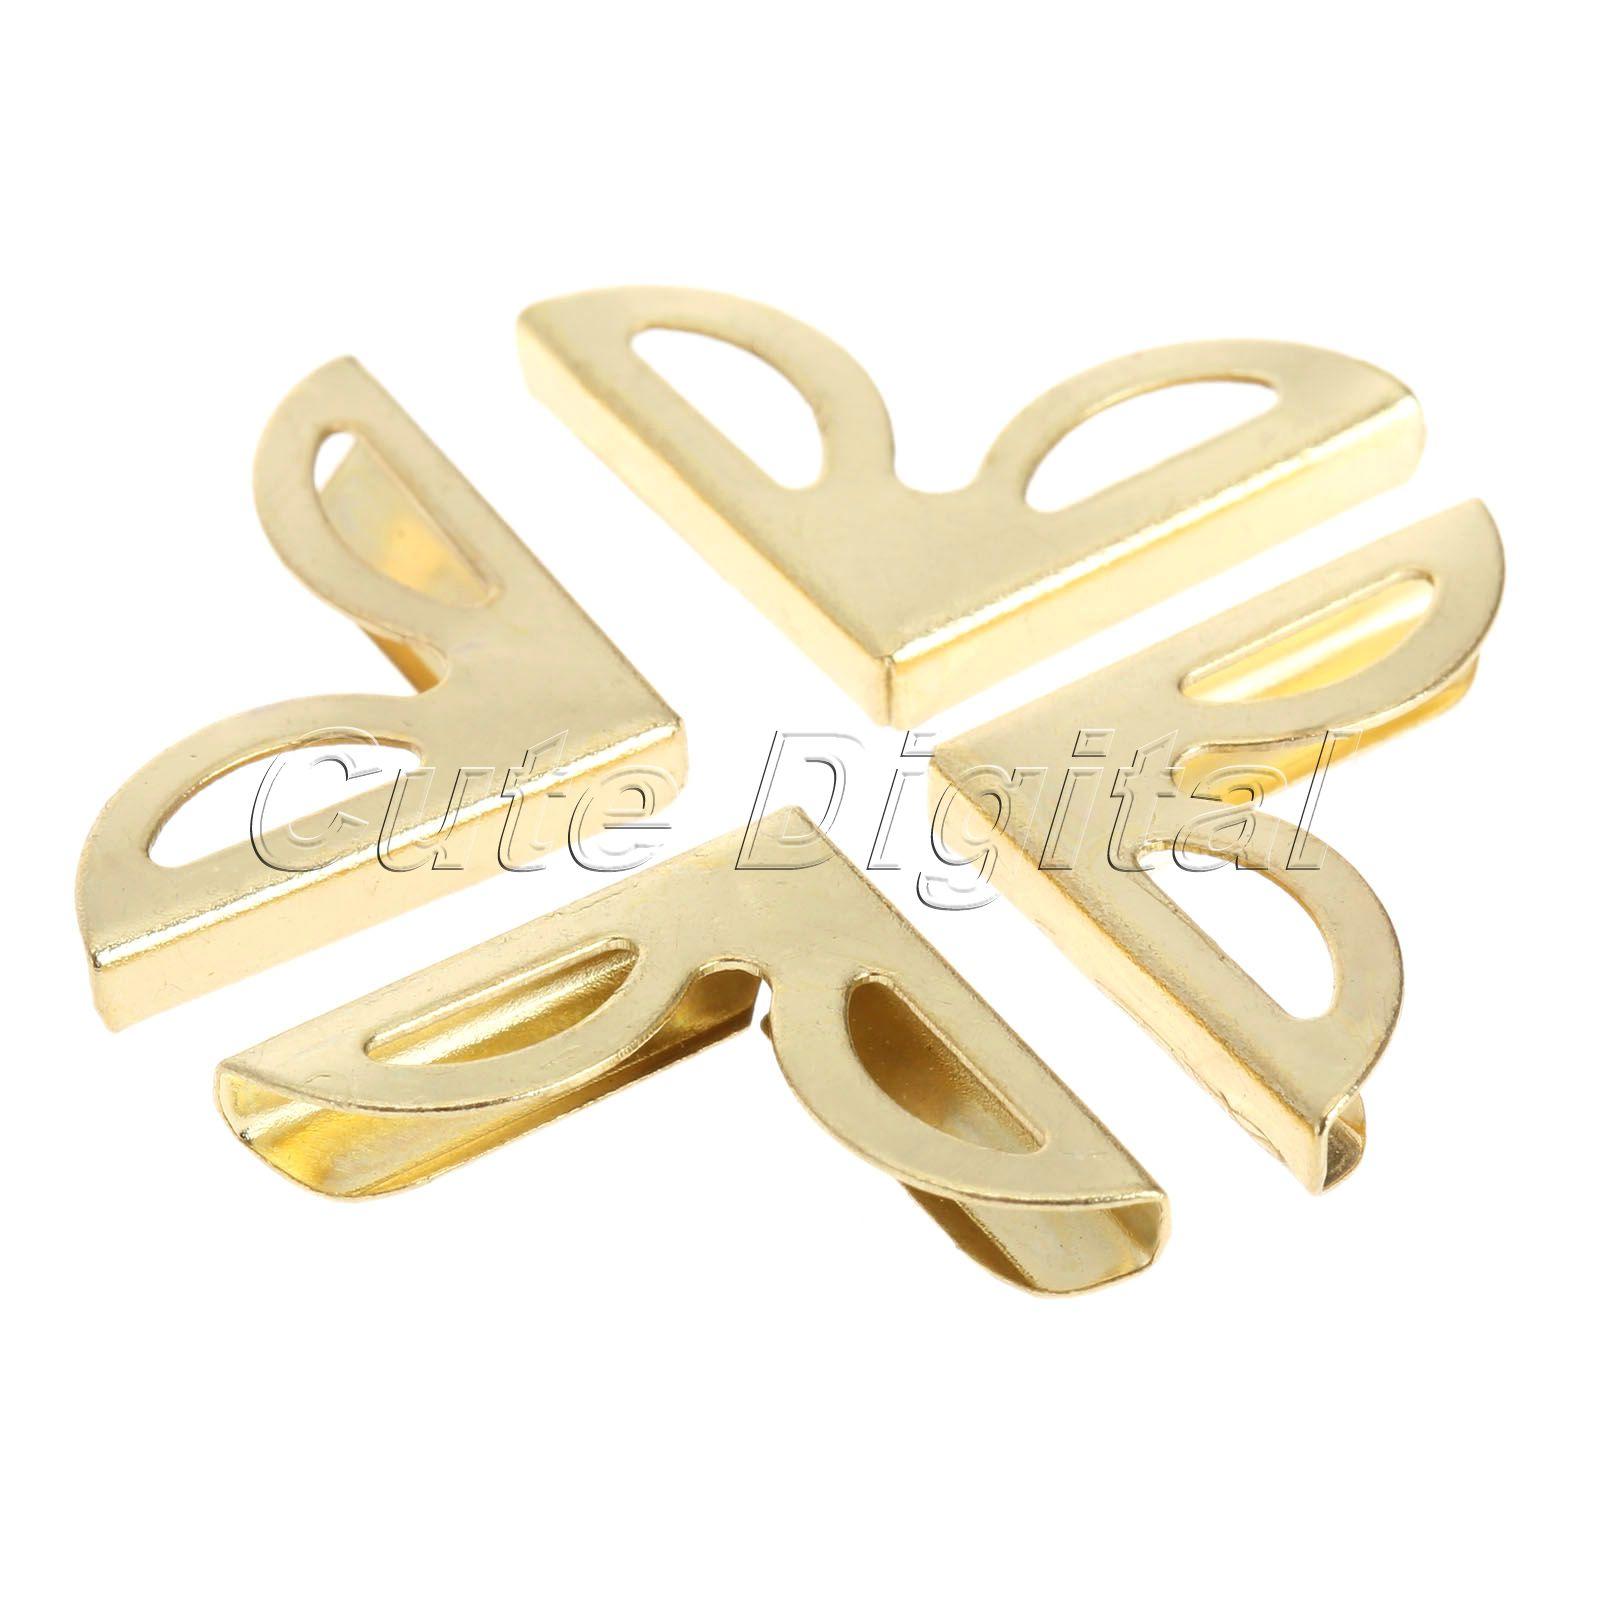 100pcs 16x16mm Golden Decorative Metal Corner Brackets For Books Scrapbooking Photo Albums Menus Corner Protectors Crafts DIY<br><br>Aliexpress